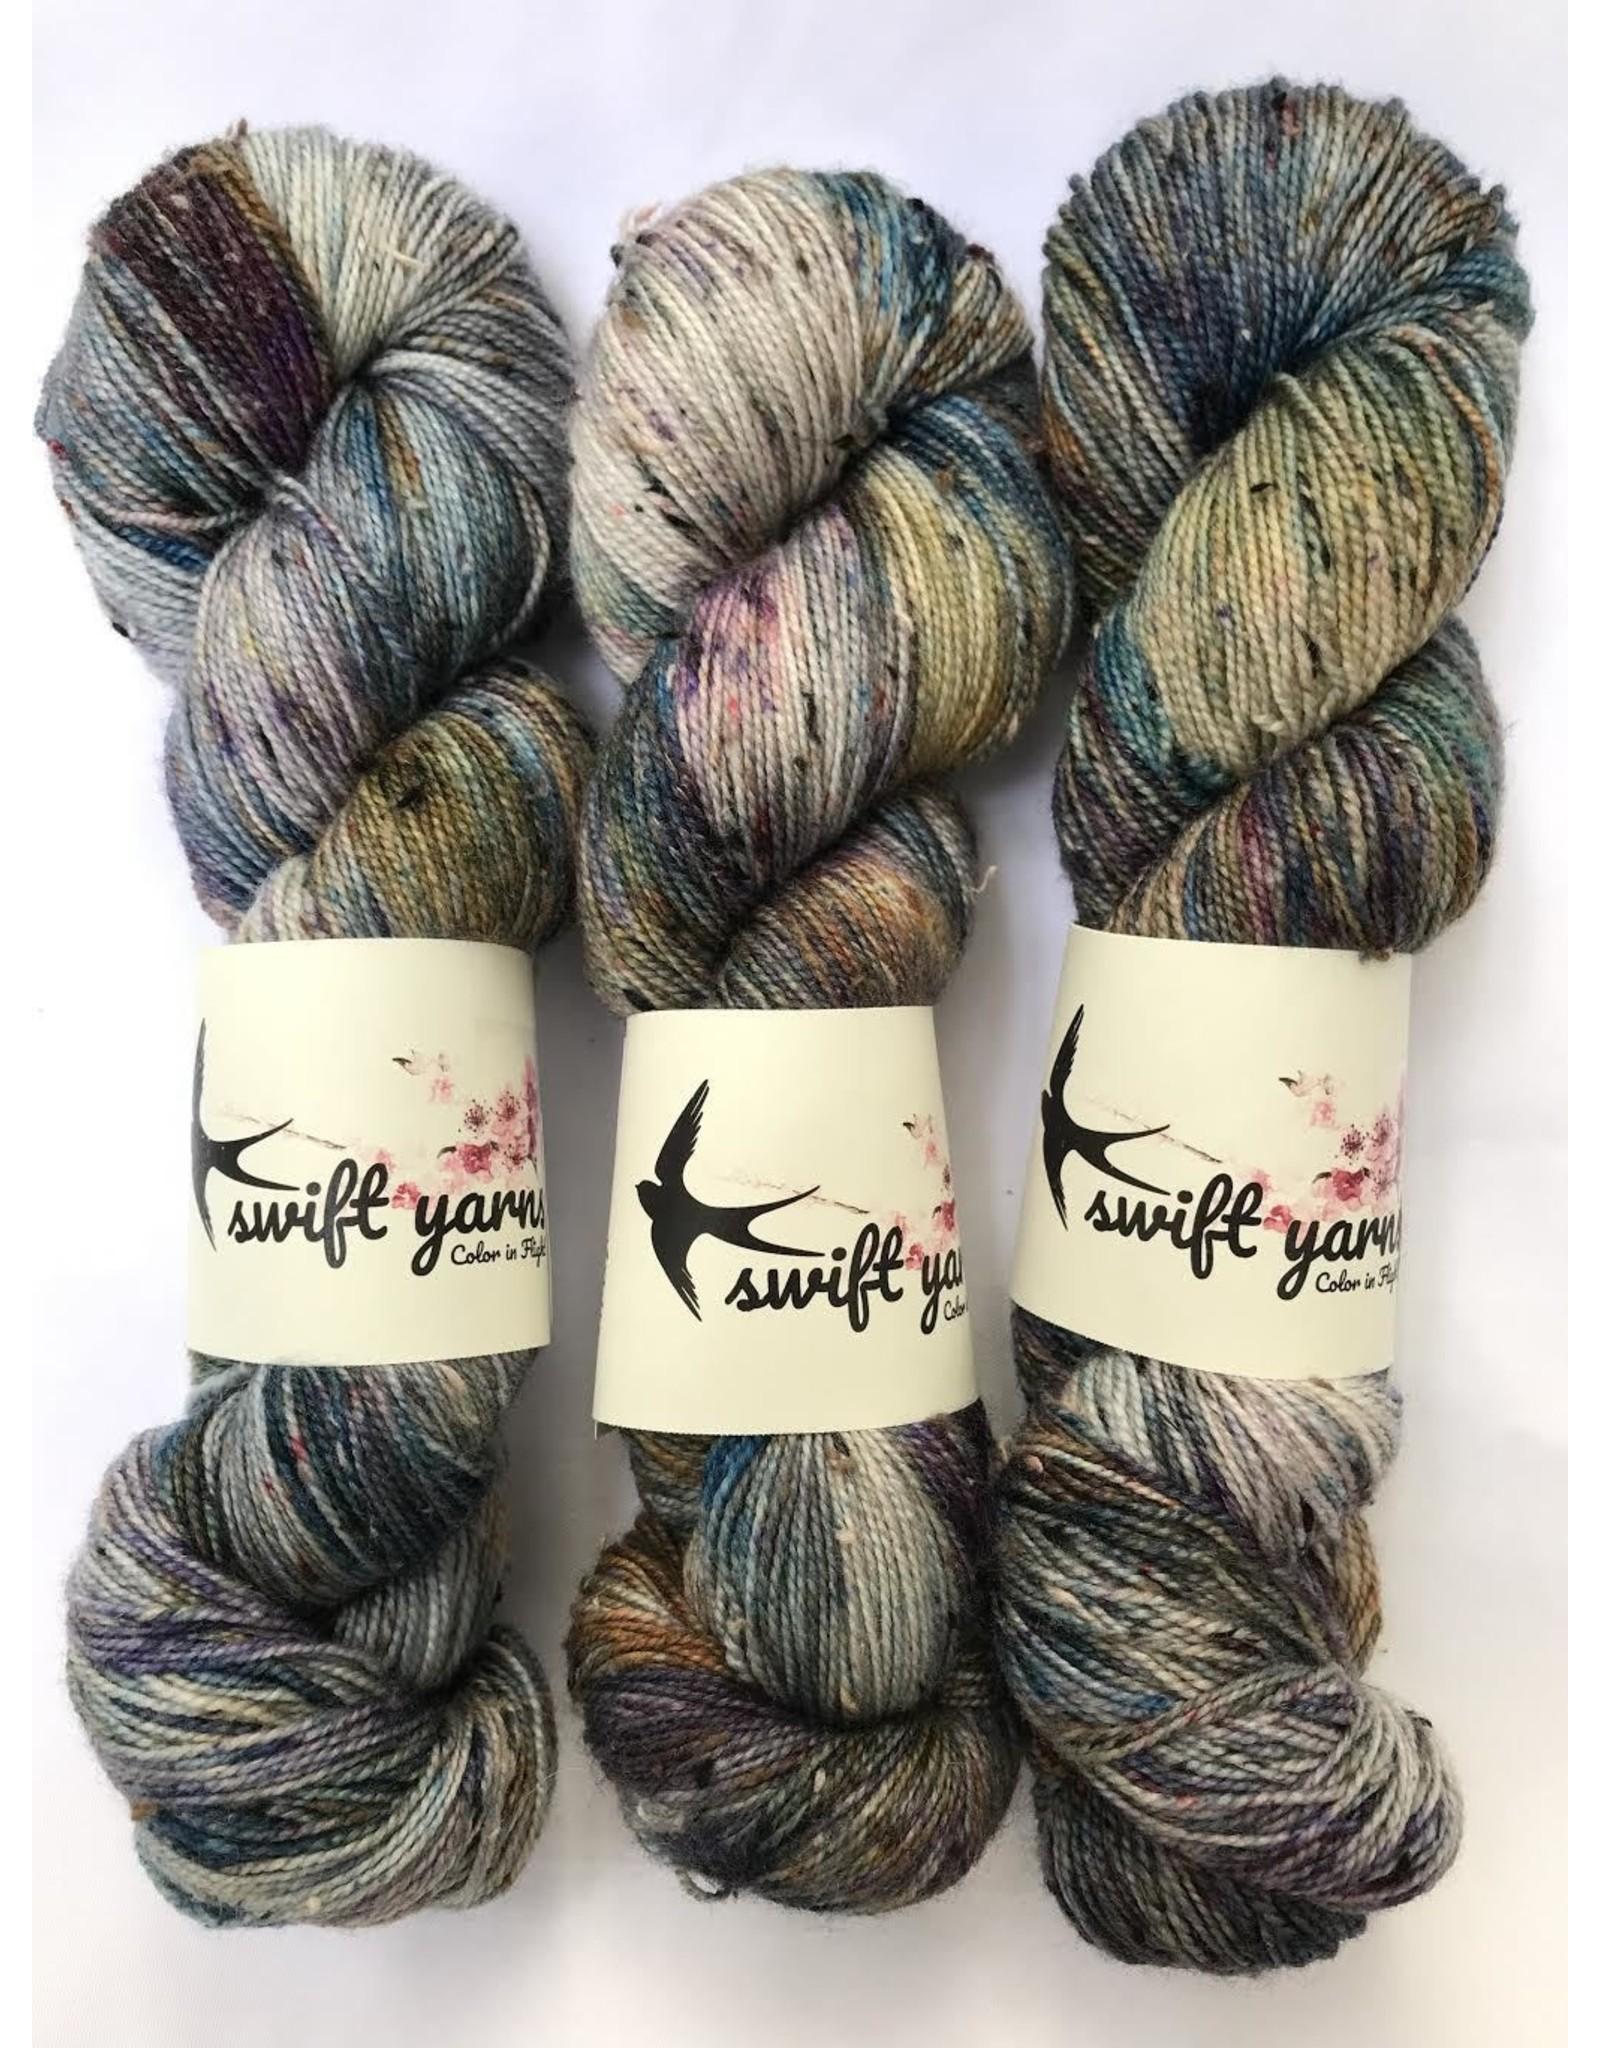 Swift Yarns Stella - Swift Tweed Sock - Swift Yarns